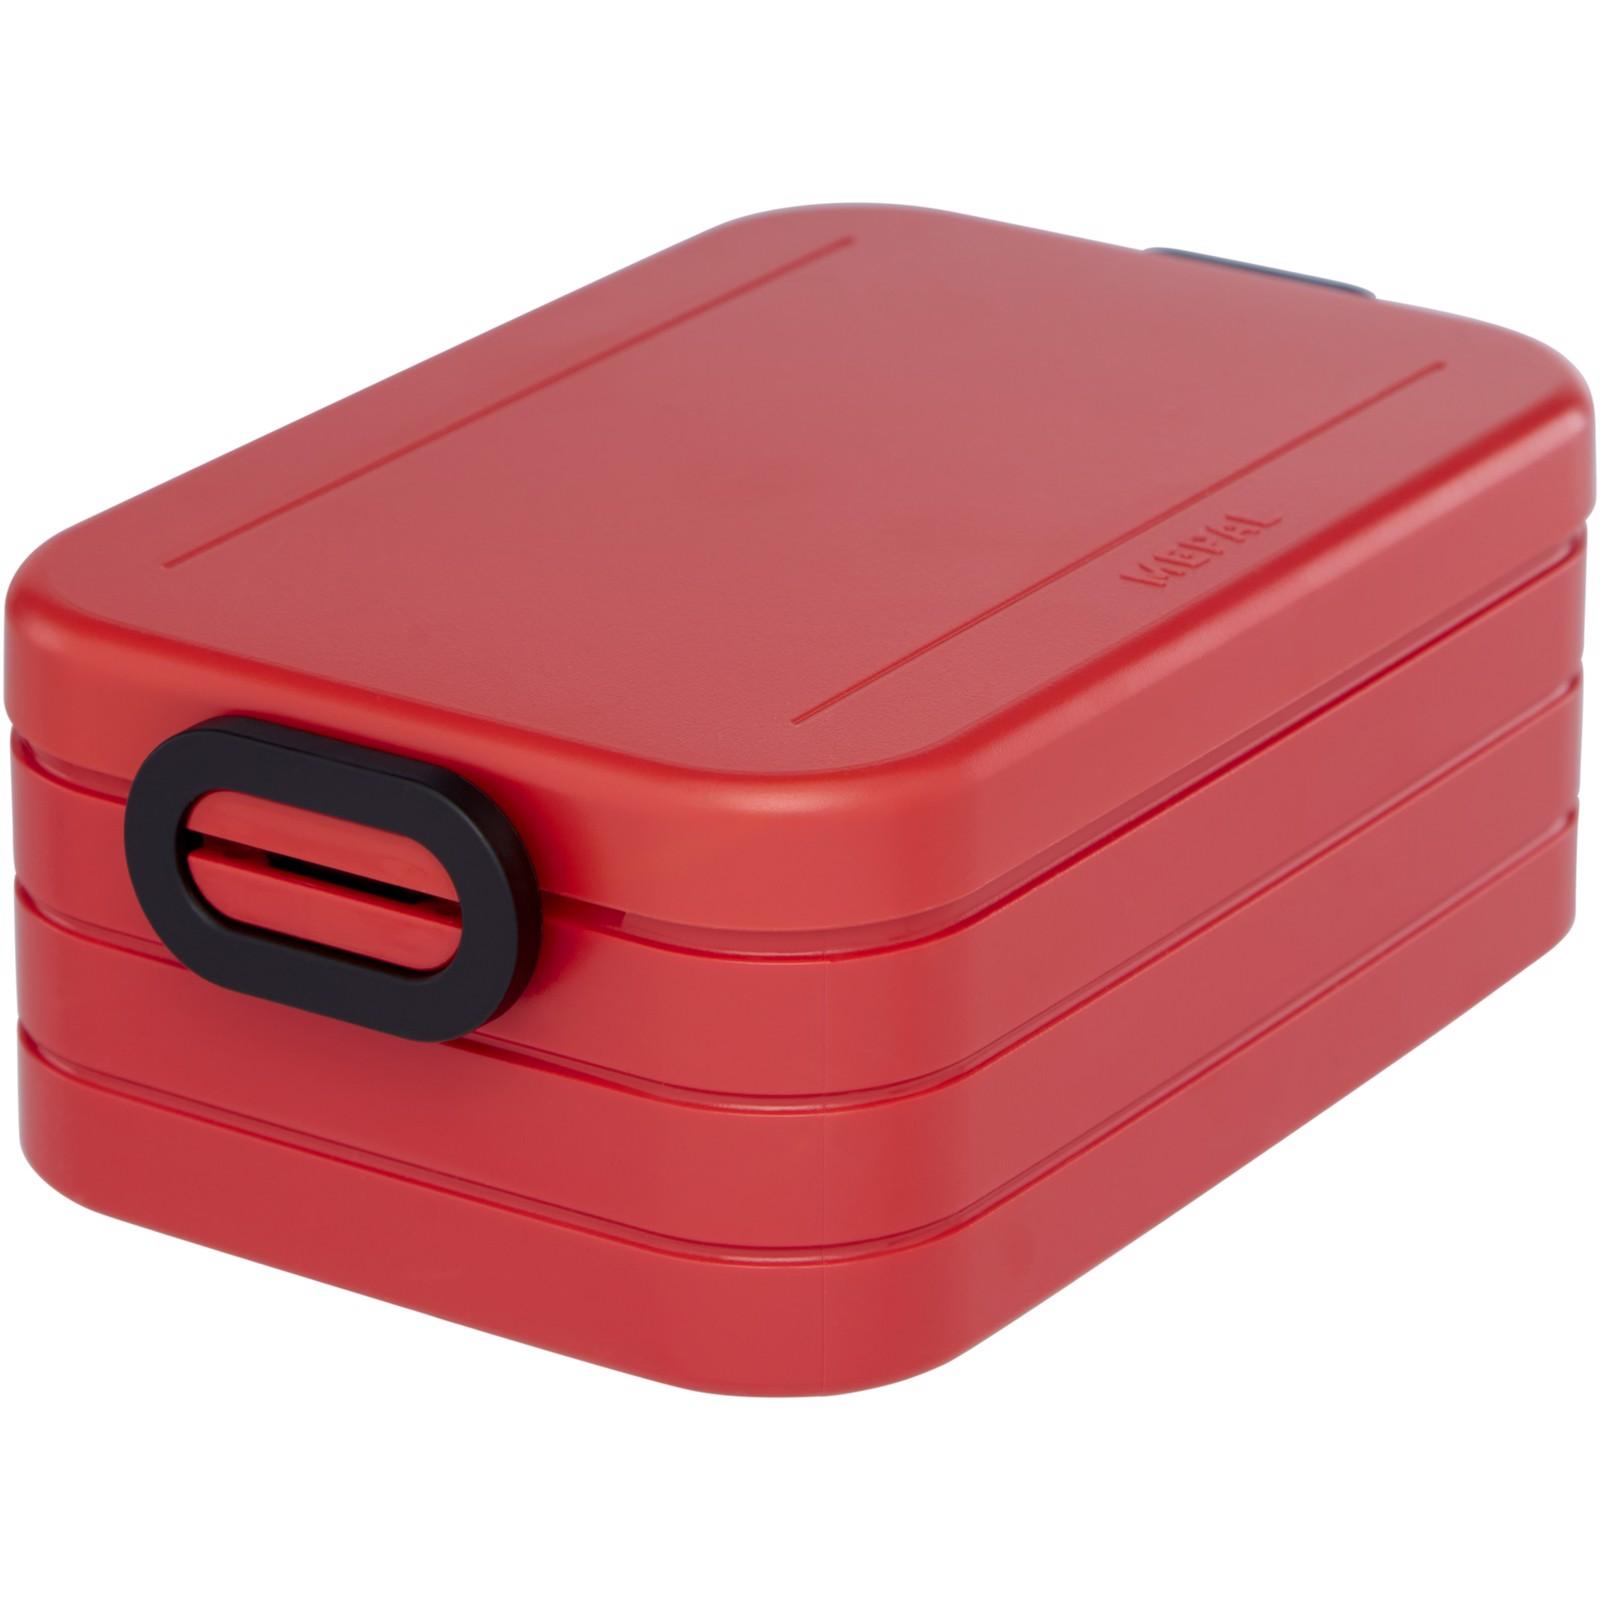 Take-a-break lunch box midi - Red